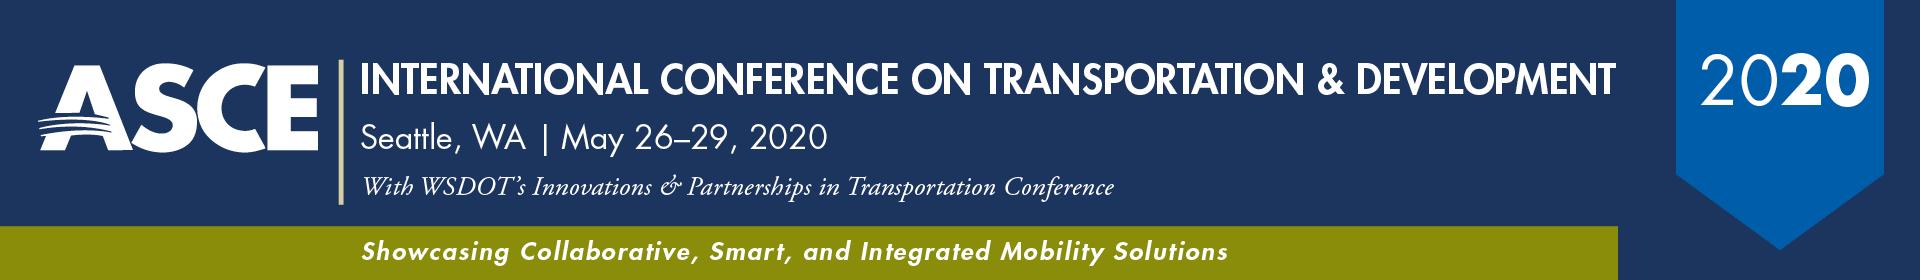 ASCE ICTD 2020 Event Banner